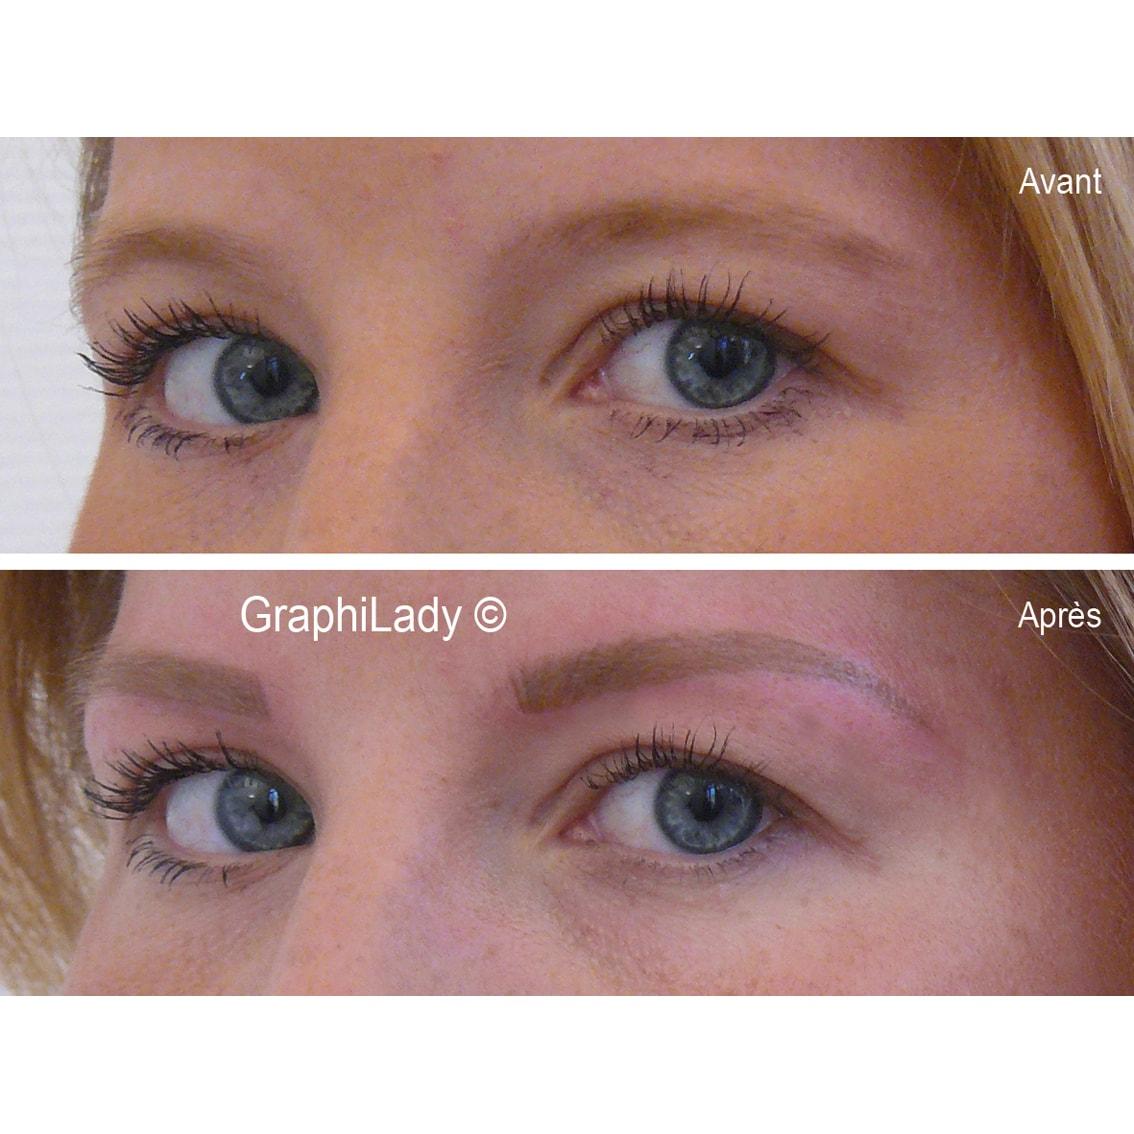 maquillage permanent sourcils 08 graphilady